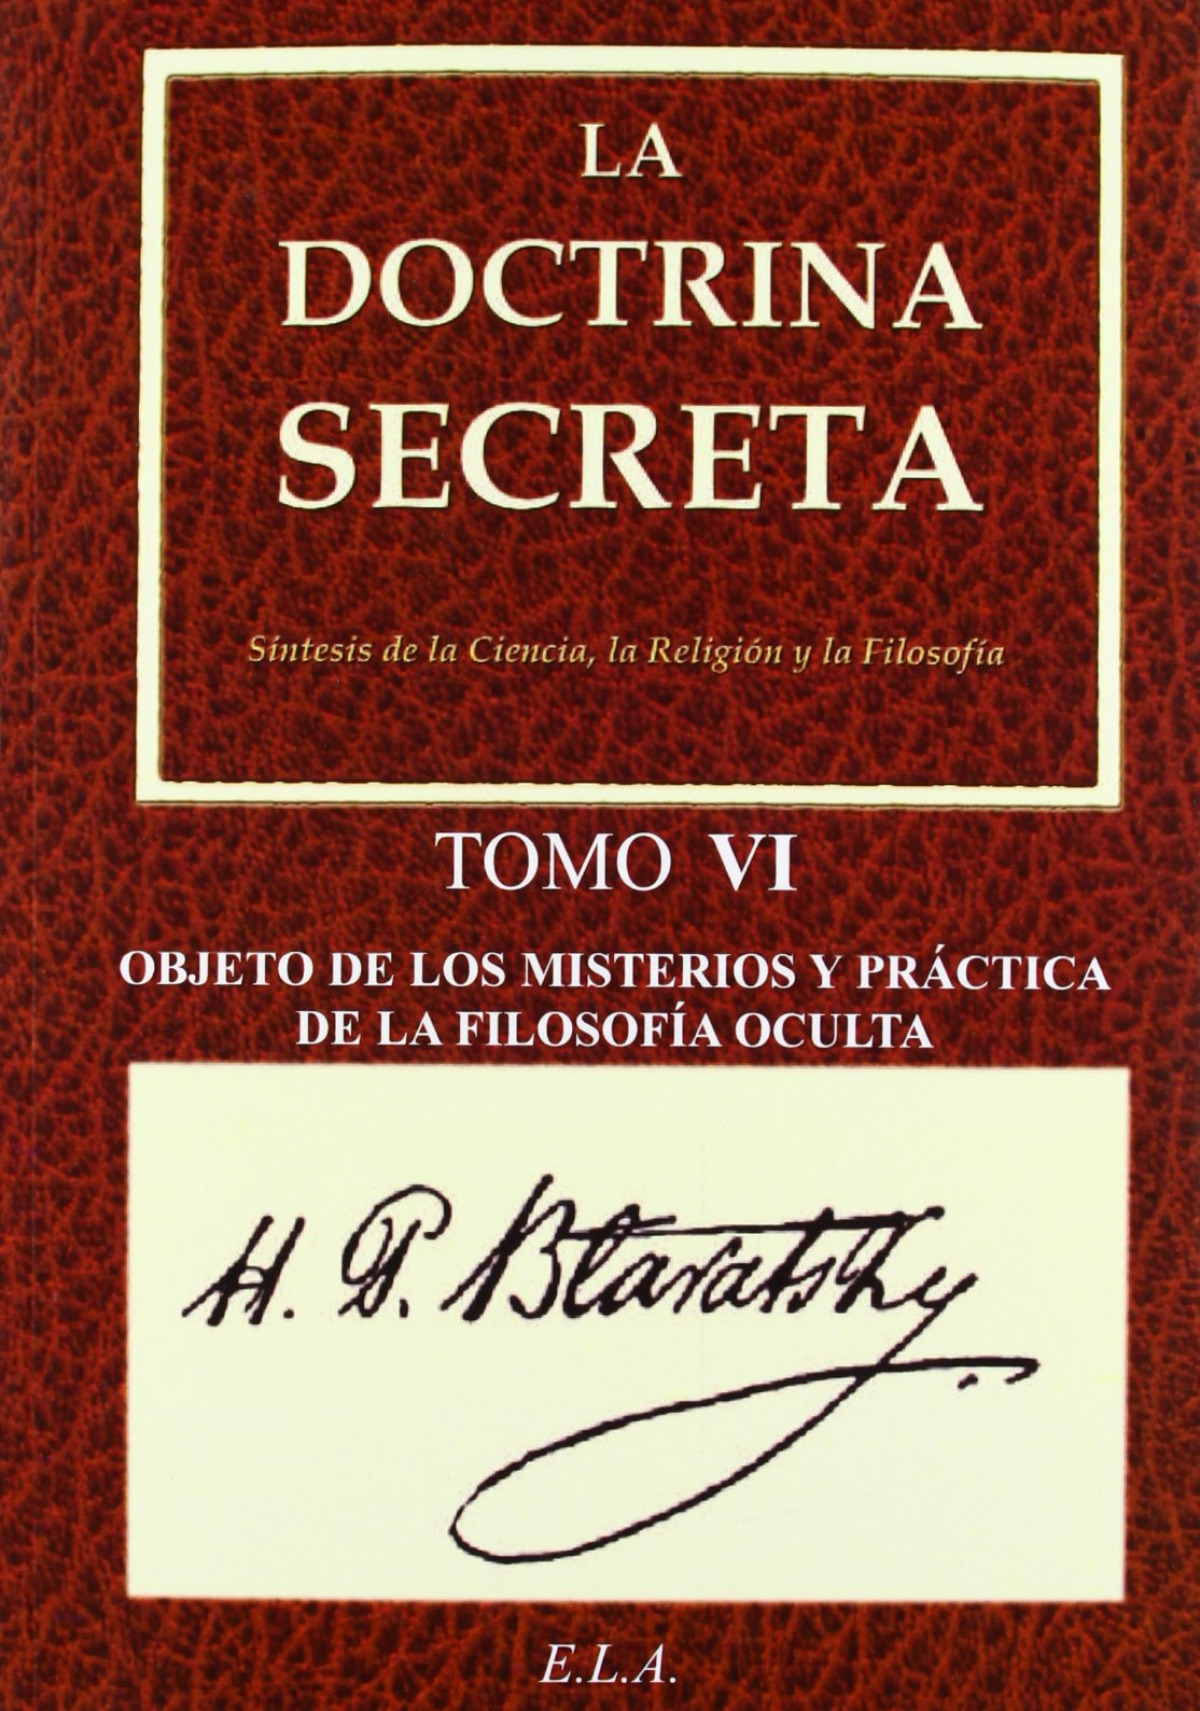 Doctrina secreta 6